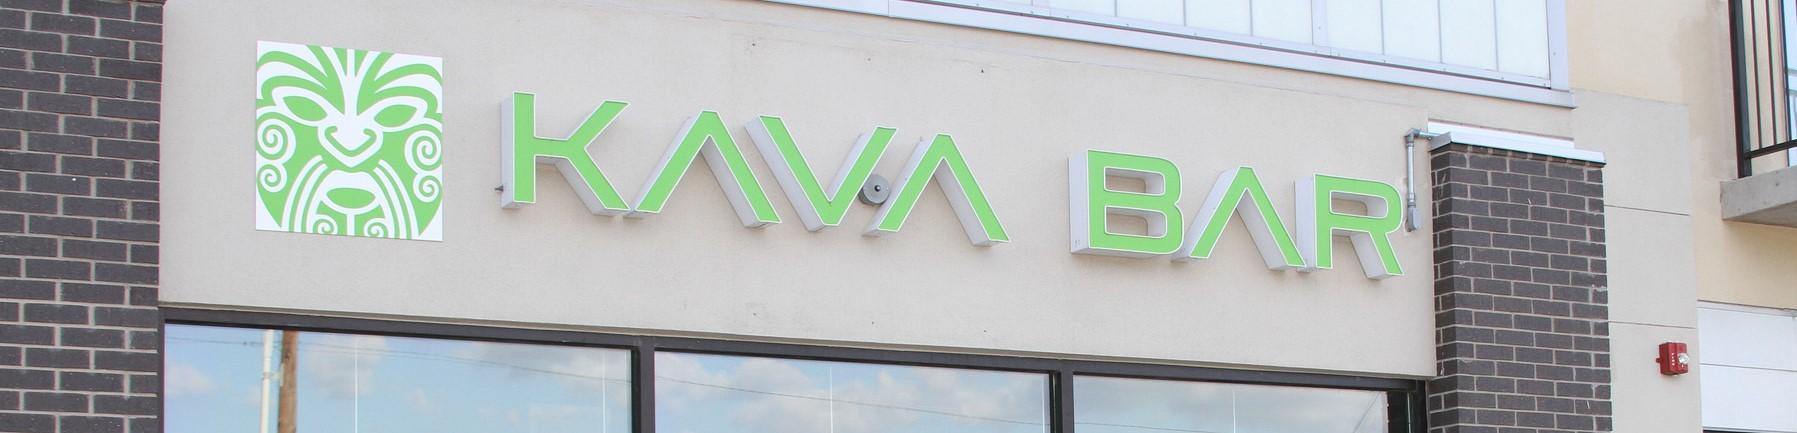 The Squarerut Kava Bar in Austin, Texas (Photo: Flickr/The Austinot)